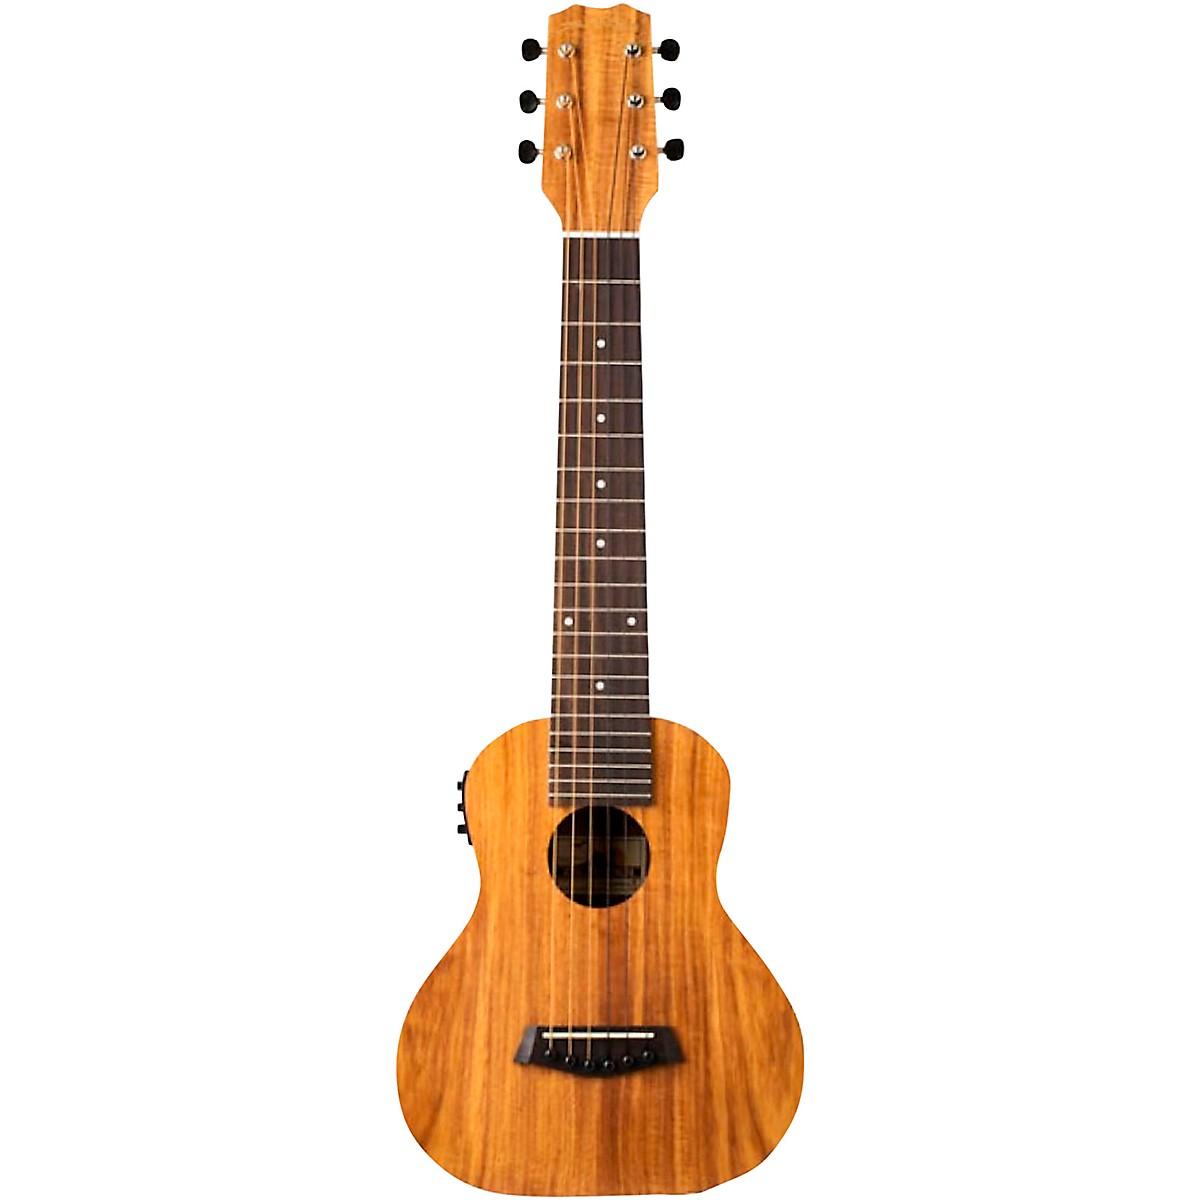 Islander Acoustic-Electric Acacia Guitarlele